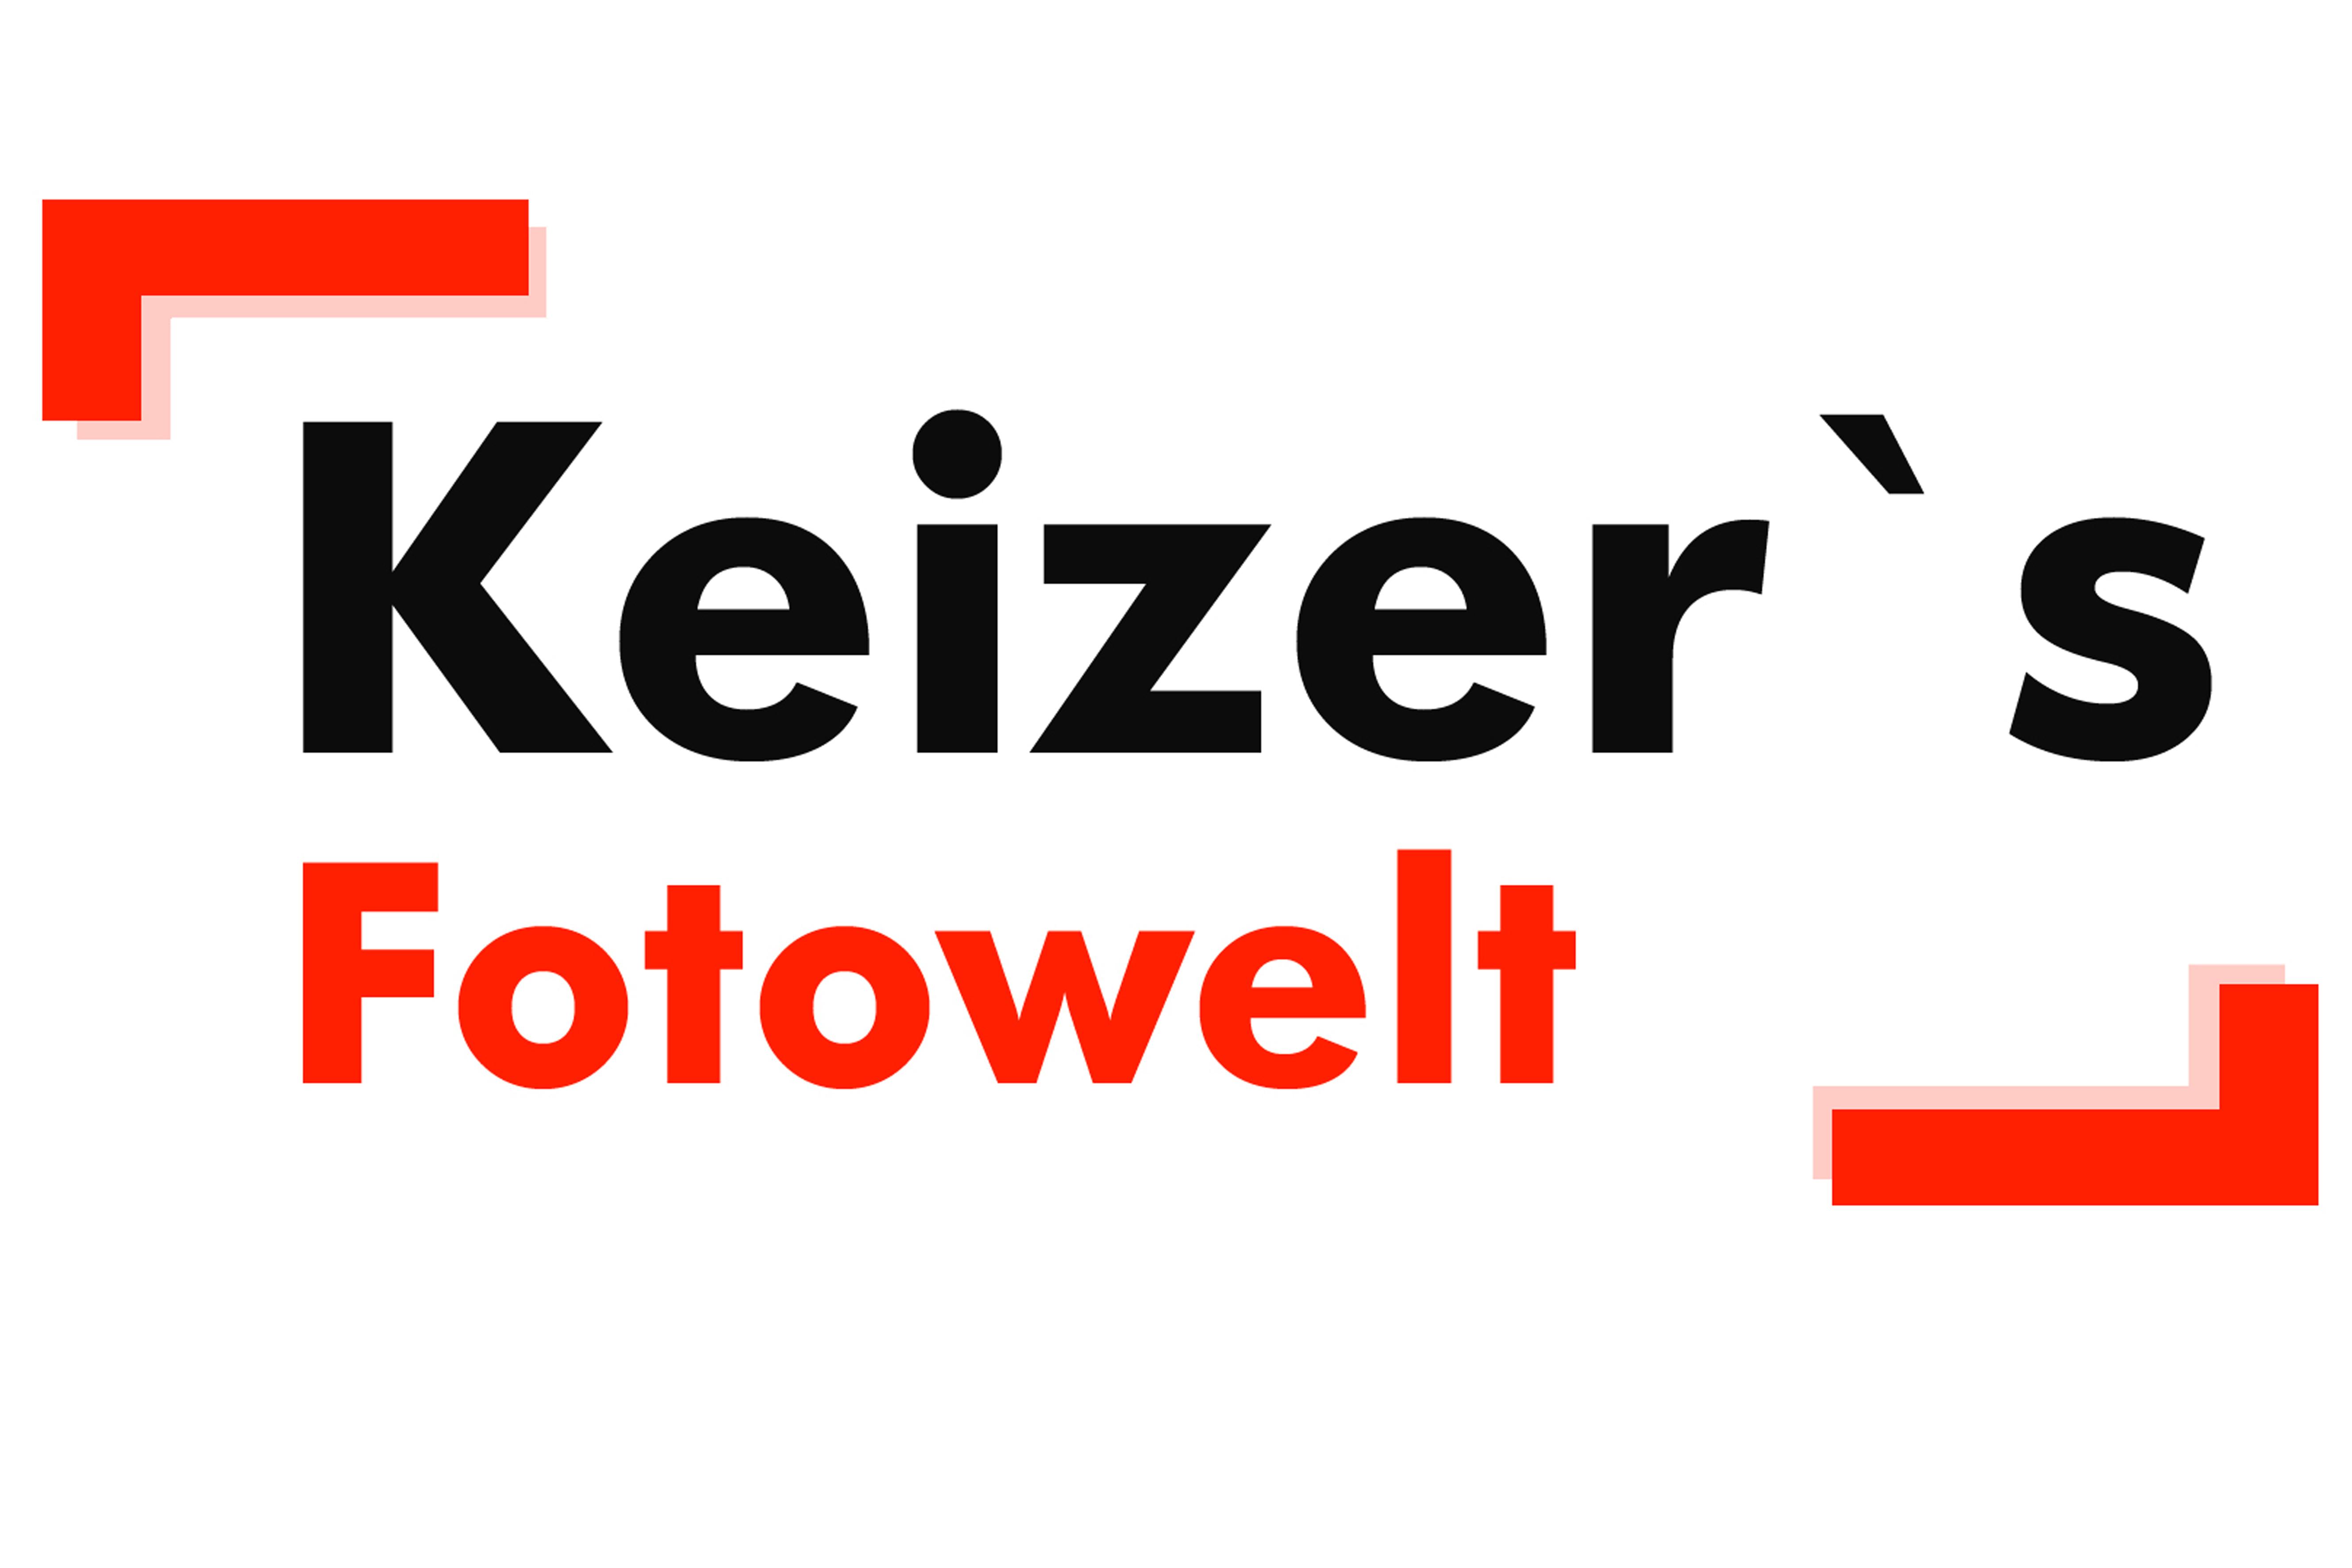 Keizers Fotowelt Footerlogo